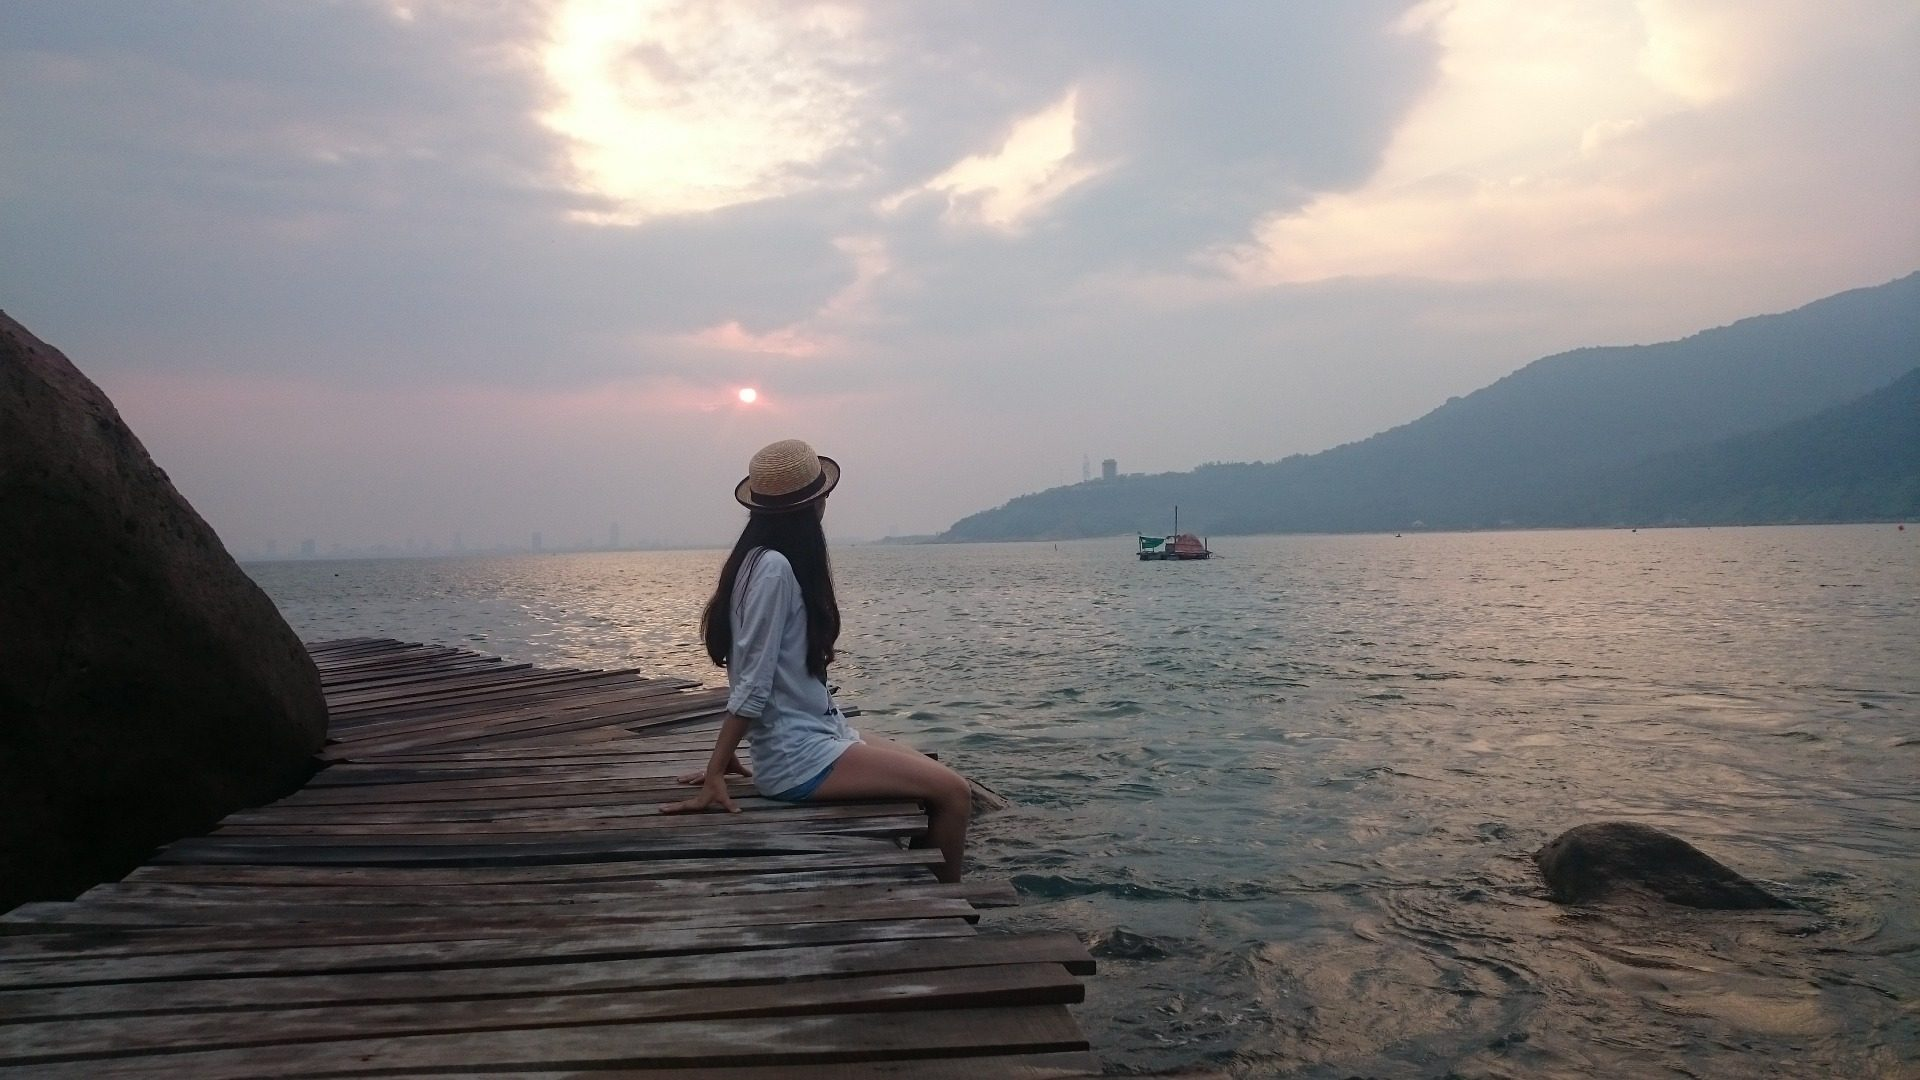 chica, mujer, mar, atardecer, relax, agua, montañas - Fondos de Pantalla HD - professor-falken.com